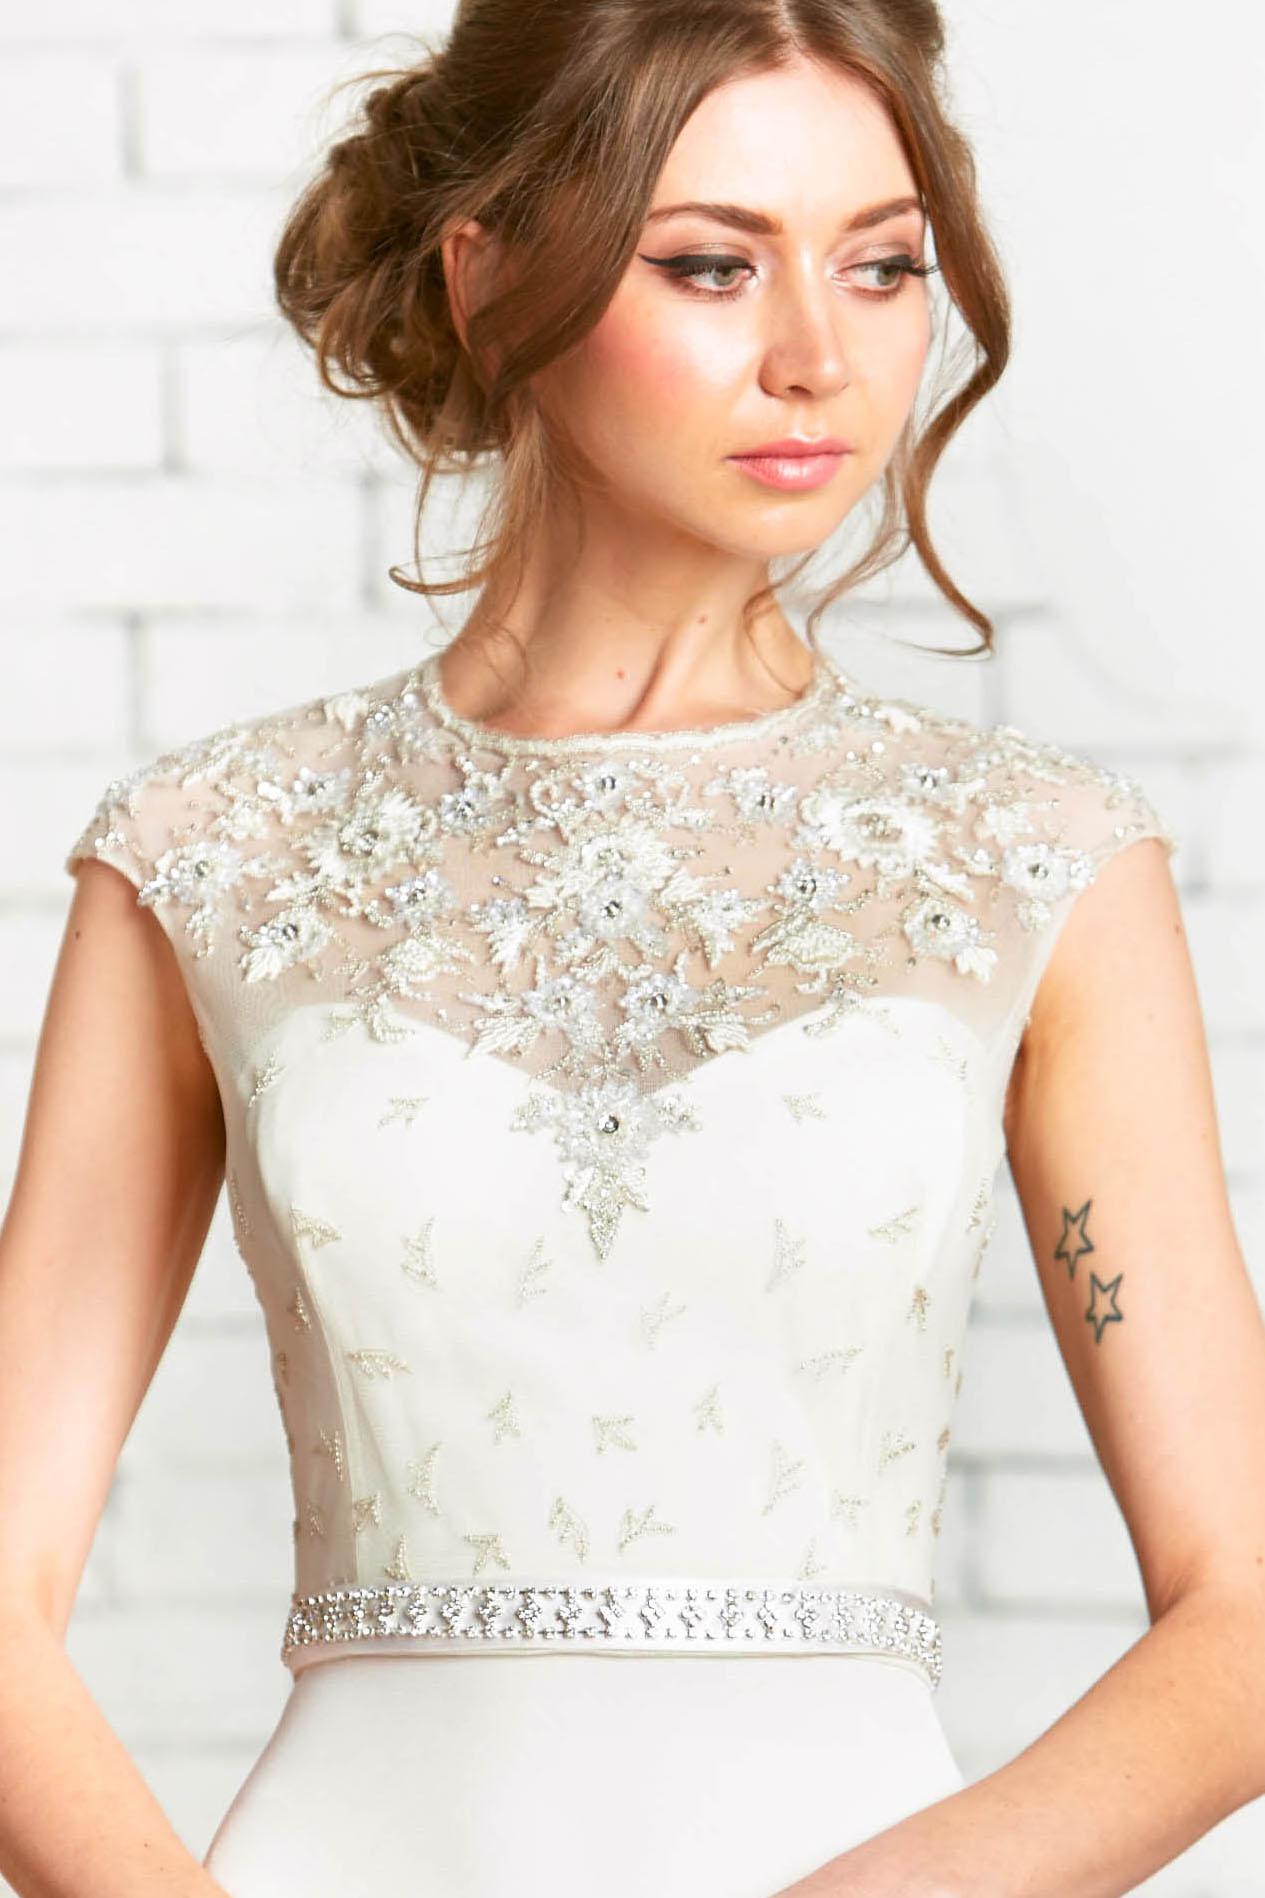 EstelleTop-Beaded_Statement_Wedding_Look_Illusion_Top.jpg